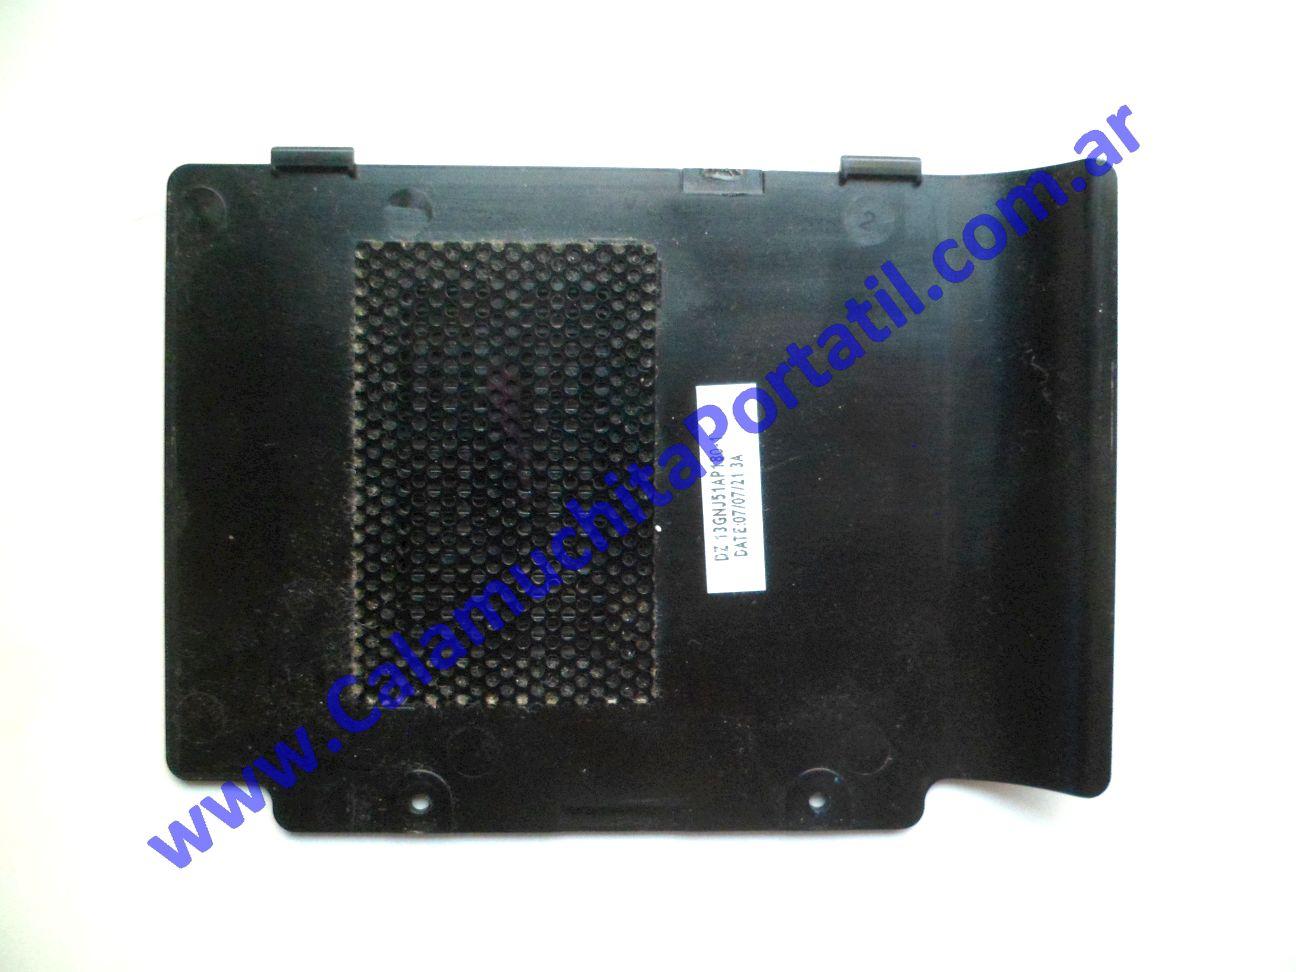 0570CTD Carcasas Tapa Disco Packard Bell EasyNote MX36-U-099 AR – ALP-Ajax C2